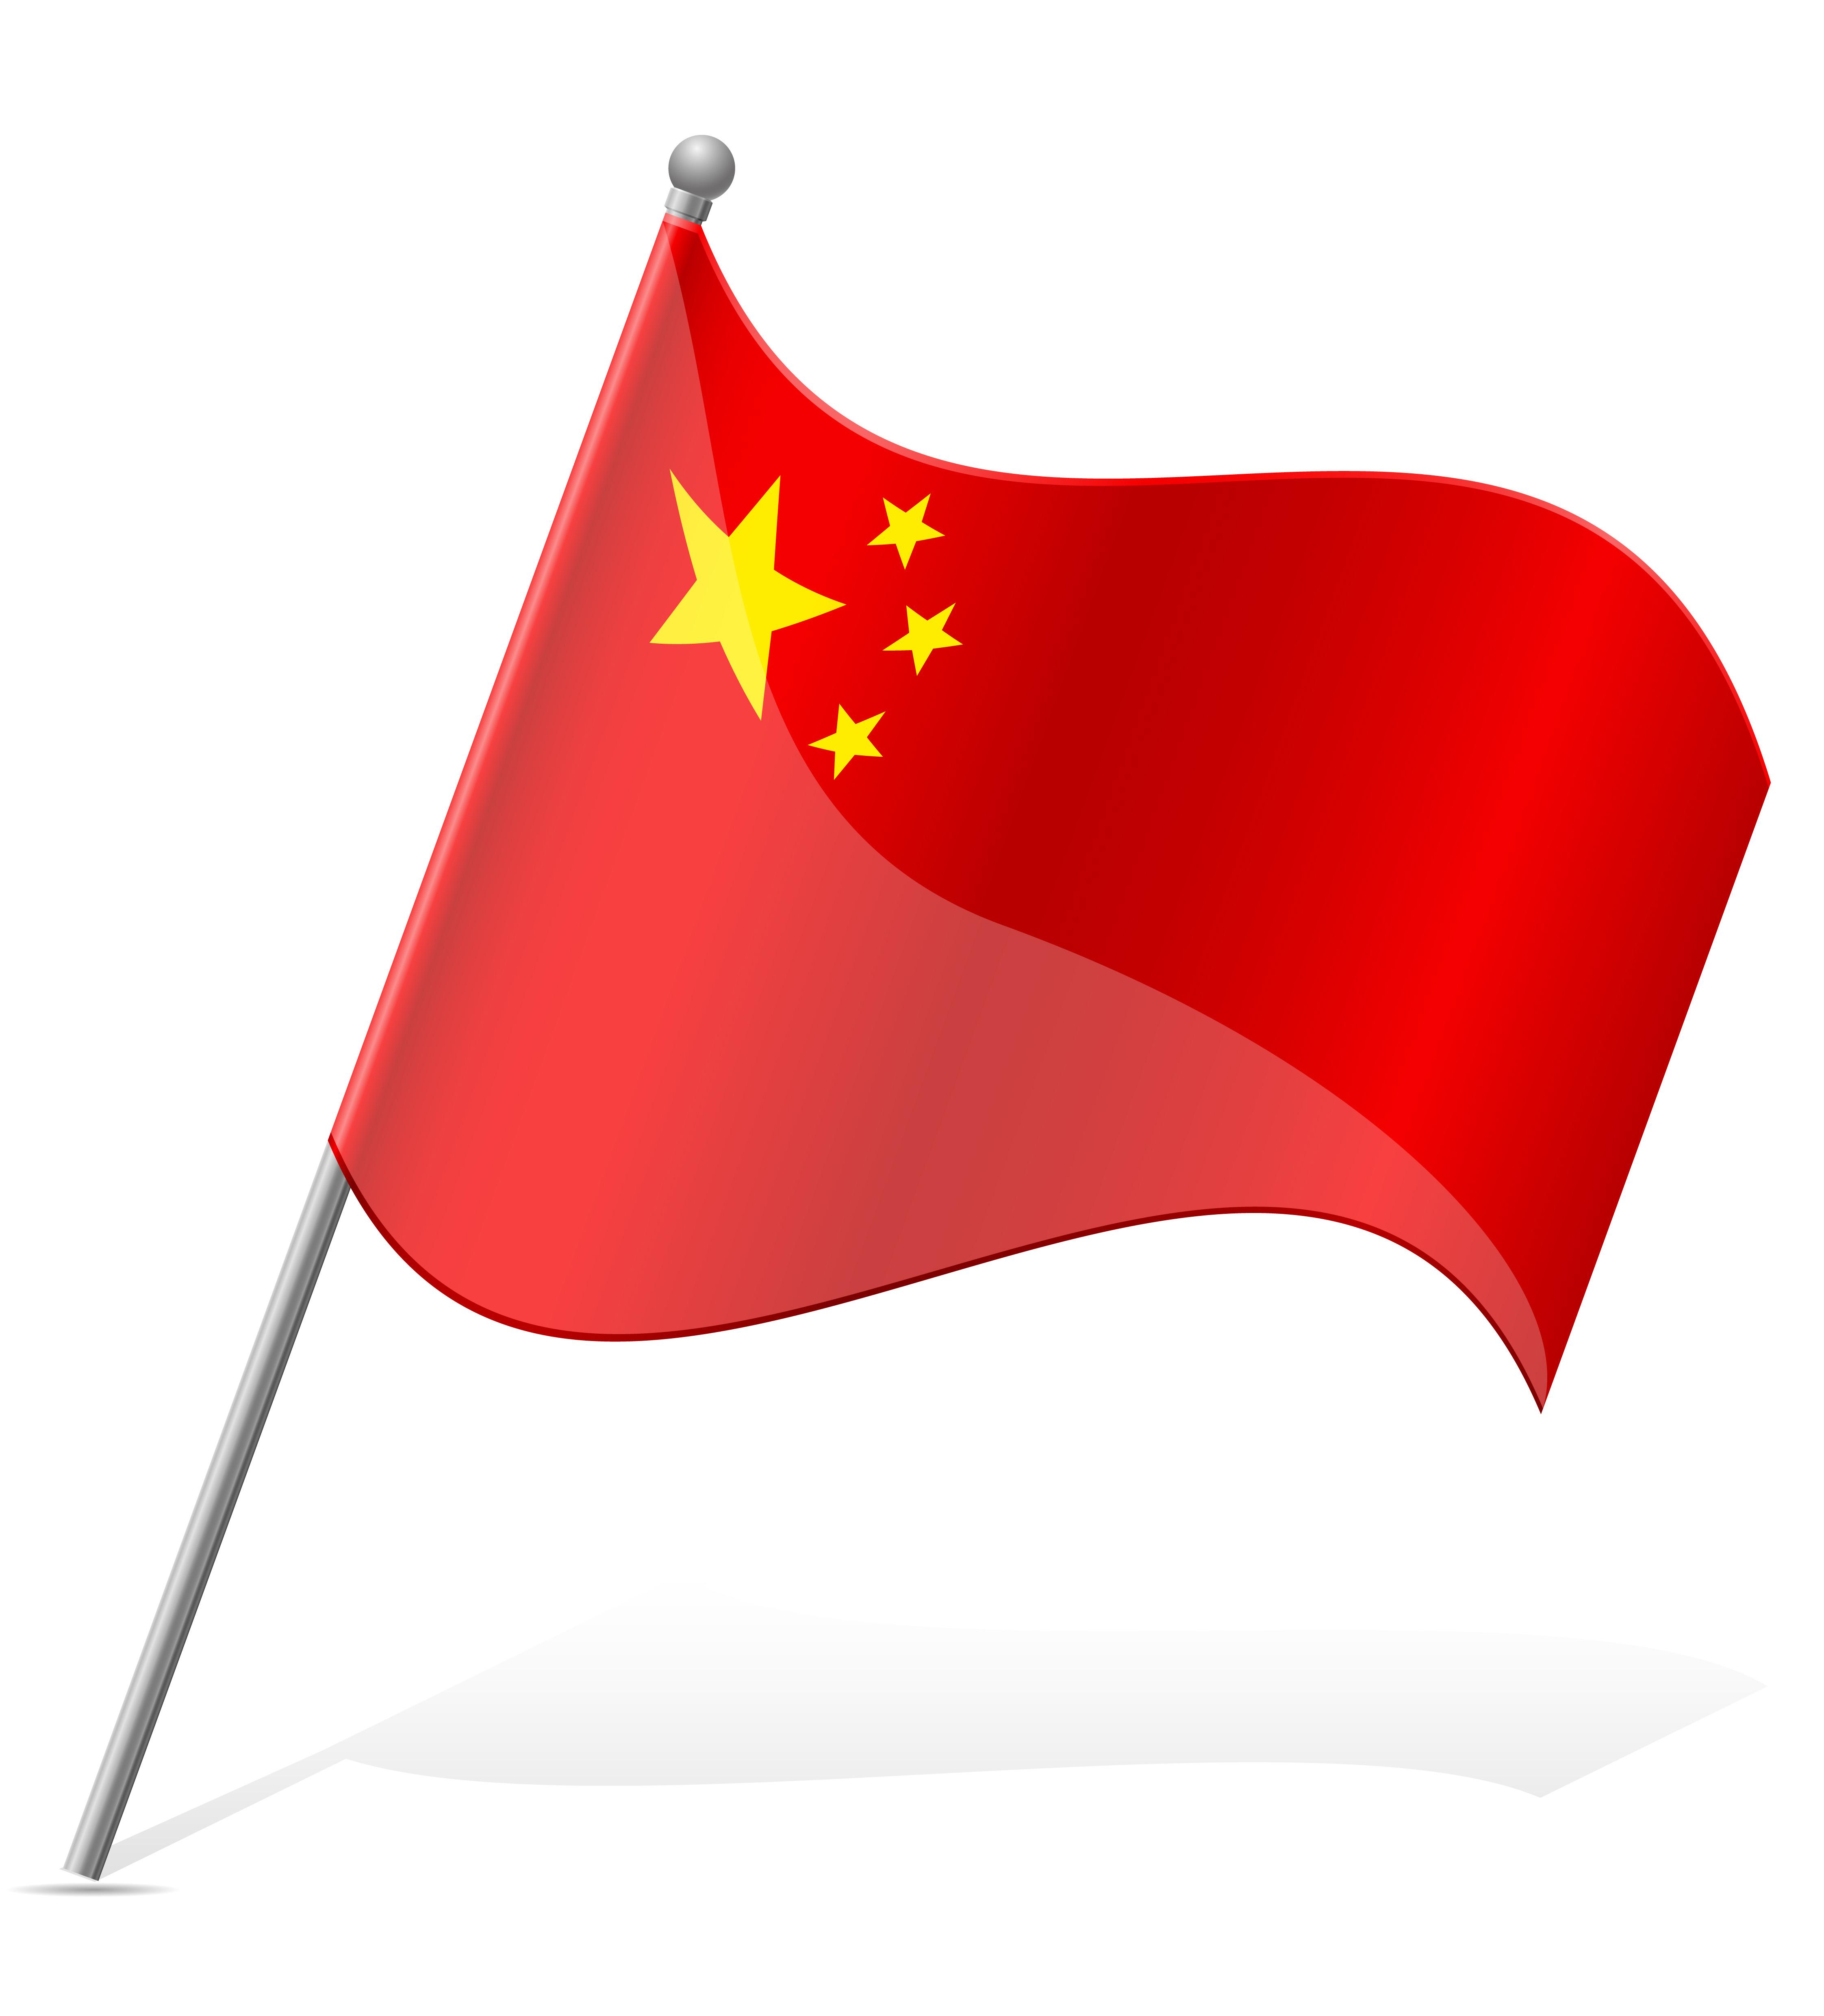 flag of China vector illustration - Download Free Vectors ...